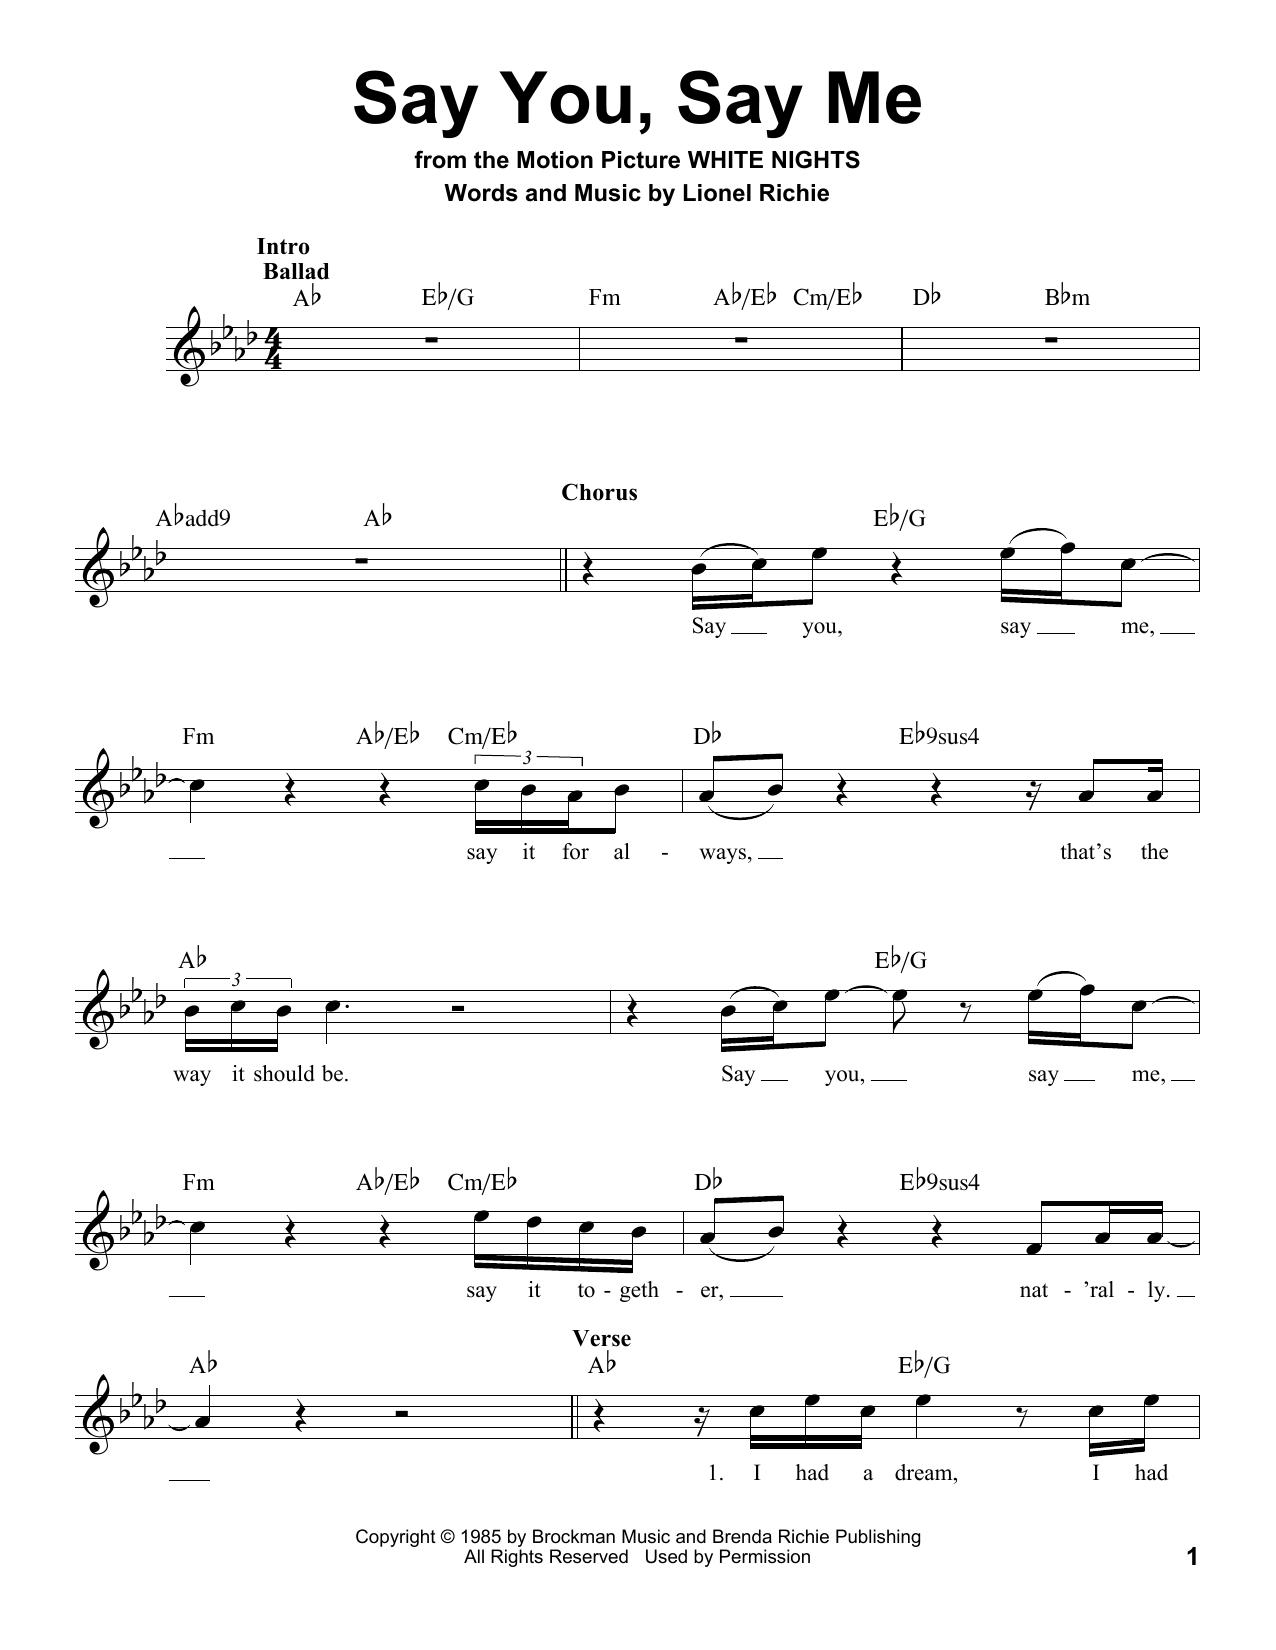 Say You, Say Me Sheet Music